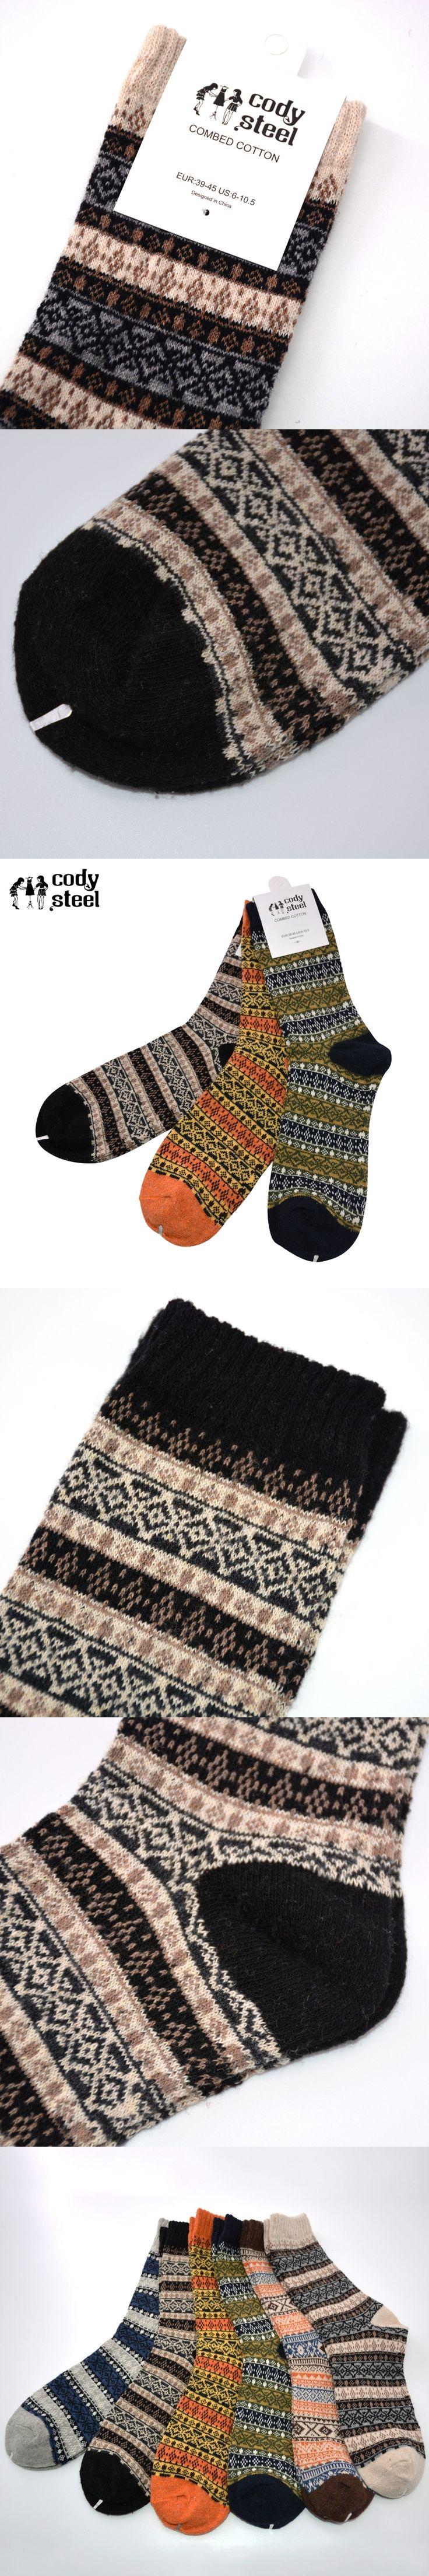 Cody Steel Thickening Socks Man Casual Comfortable Men Wool Socks Absorb Sweat Warm Fashion Socks For Male 3pairs(Fit 39-45)